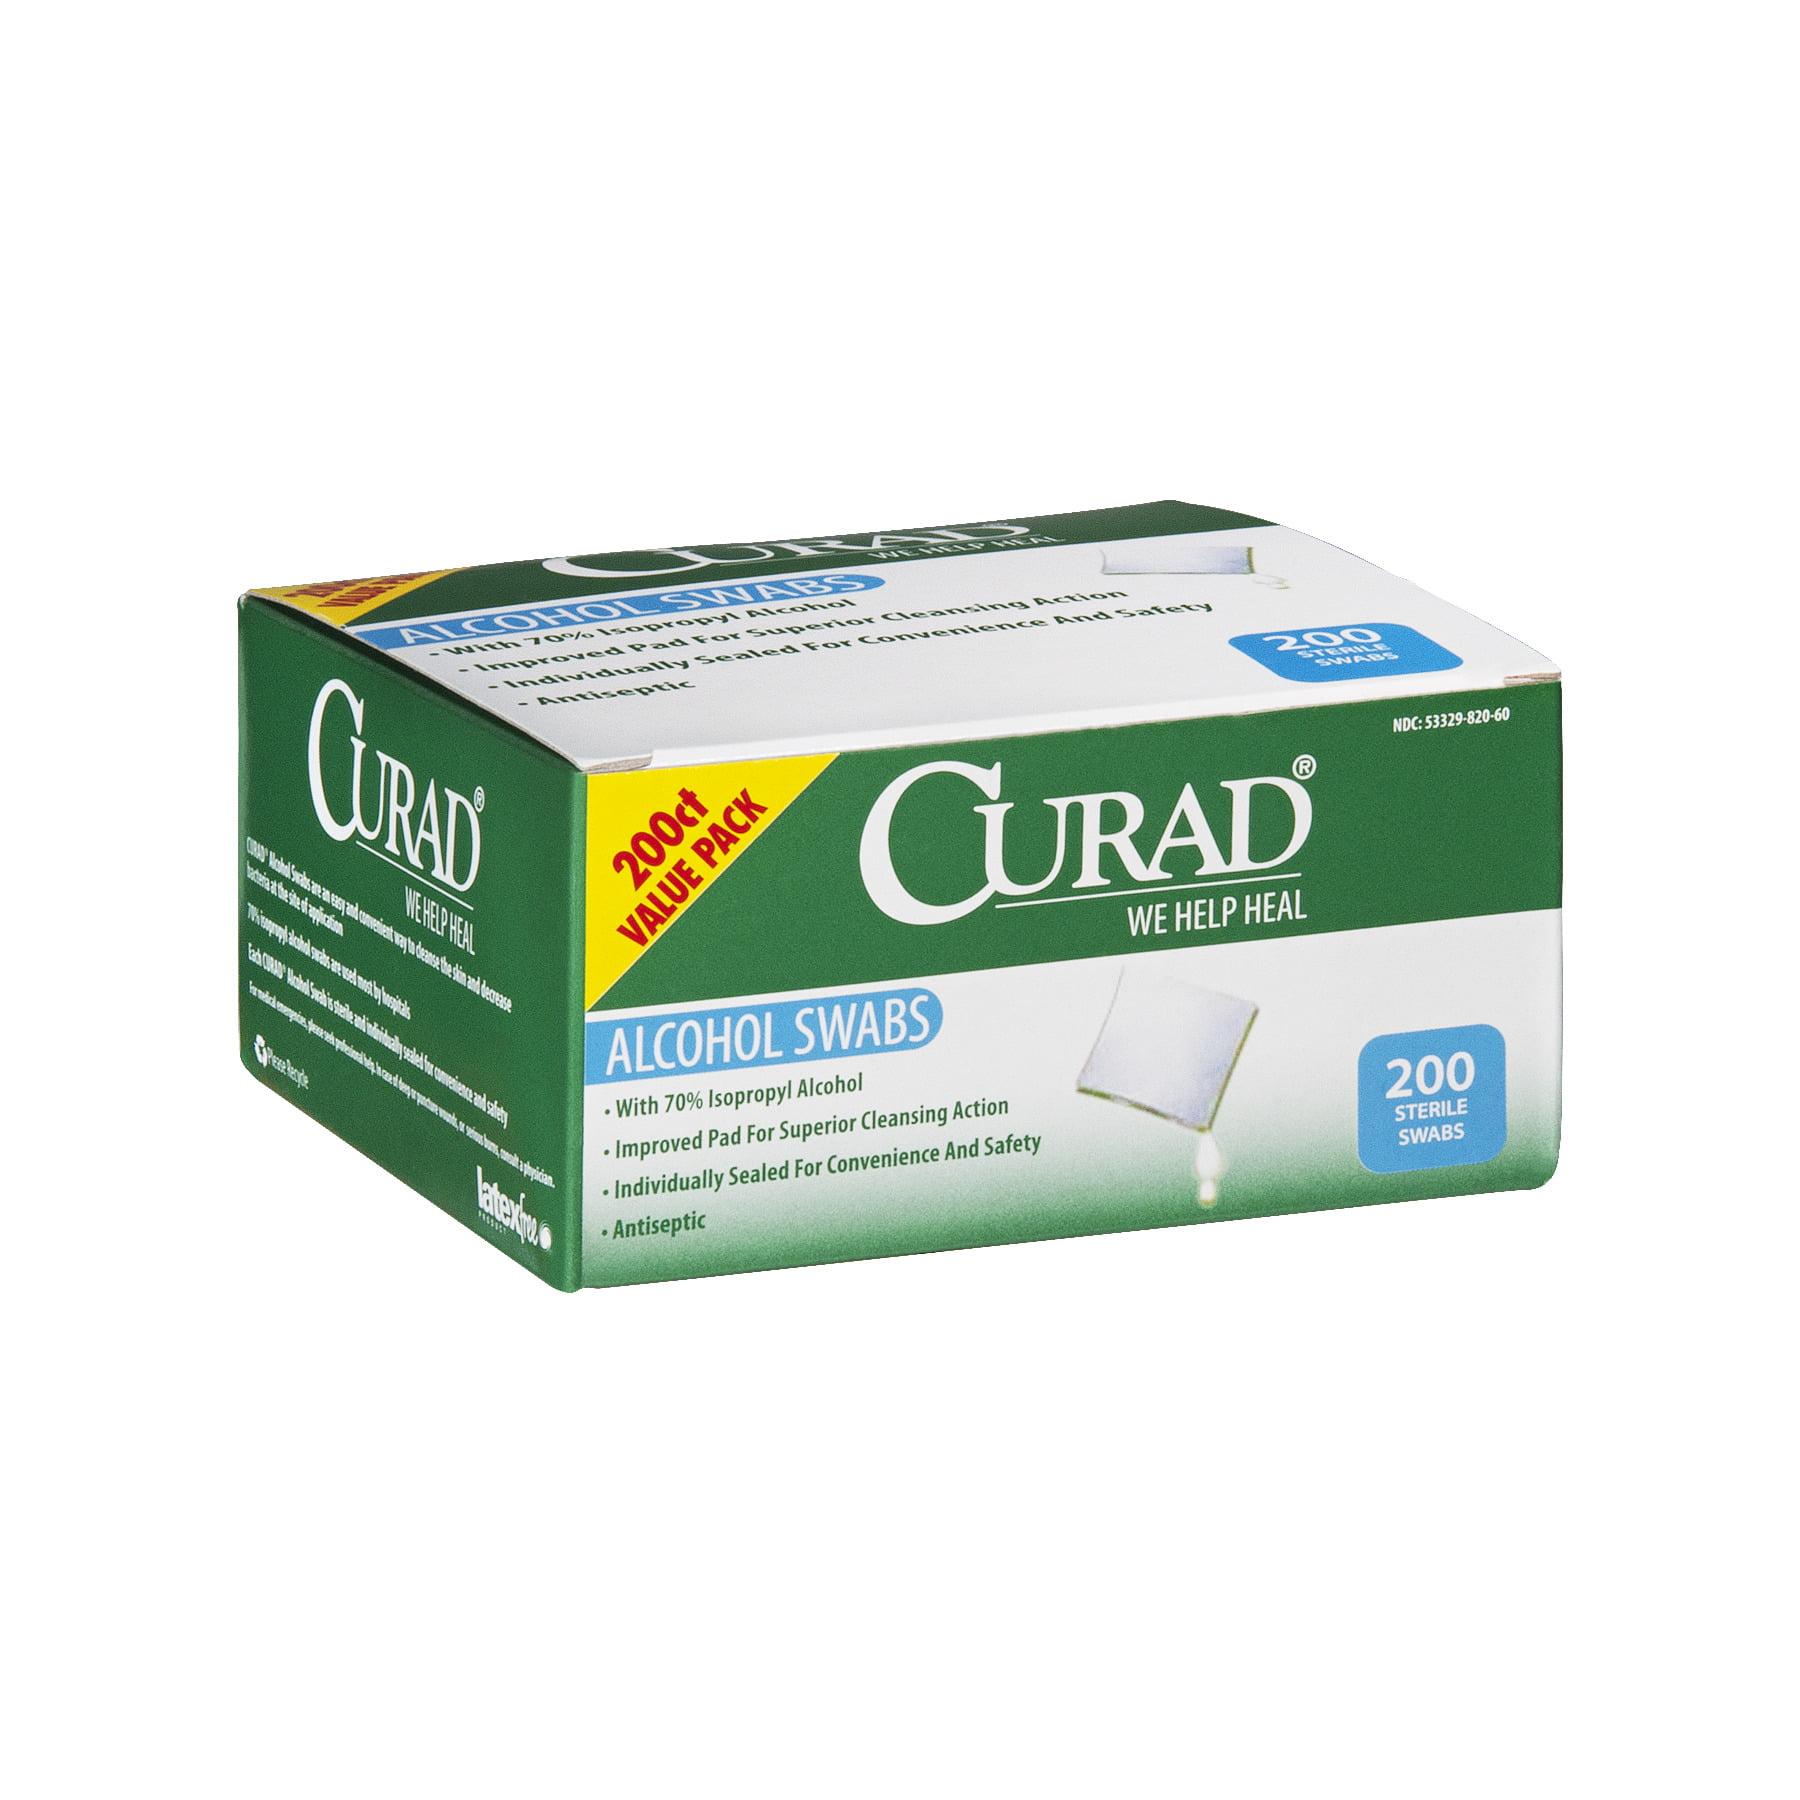 Curad Alcohol Swabs Sterile - 200 CT200.0 CT